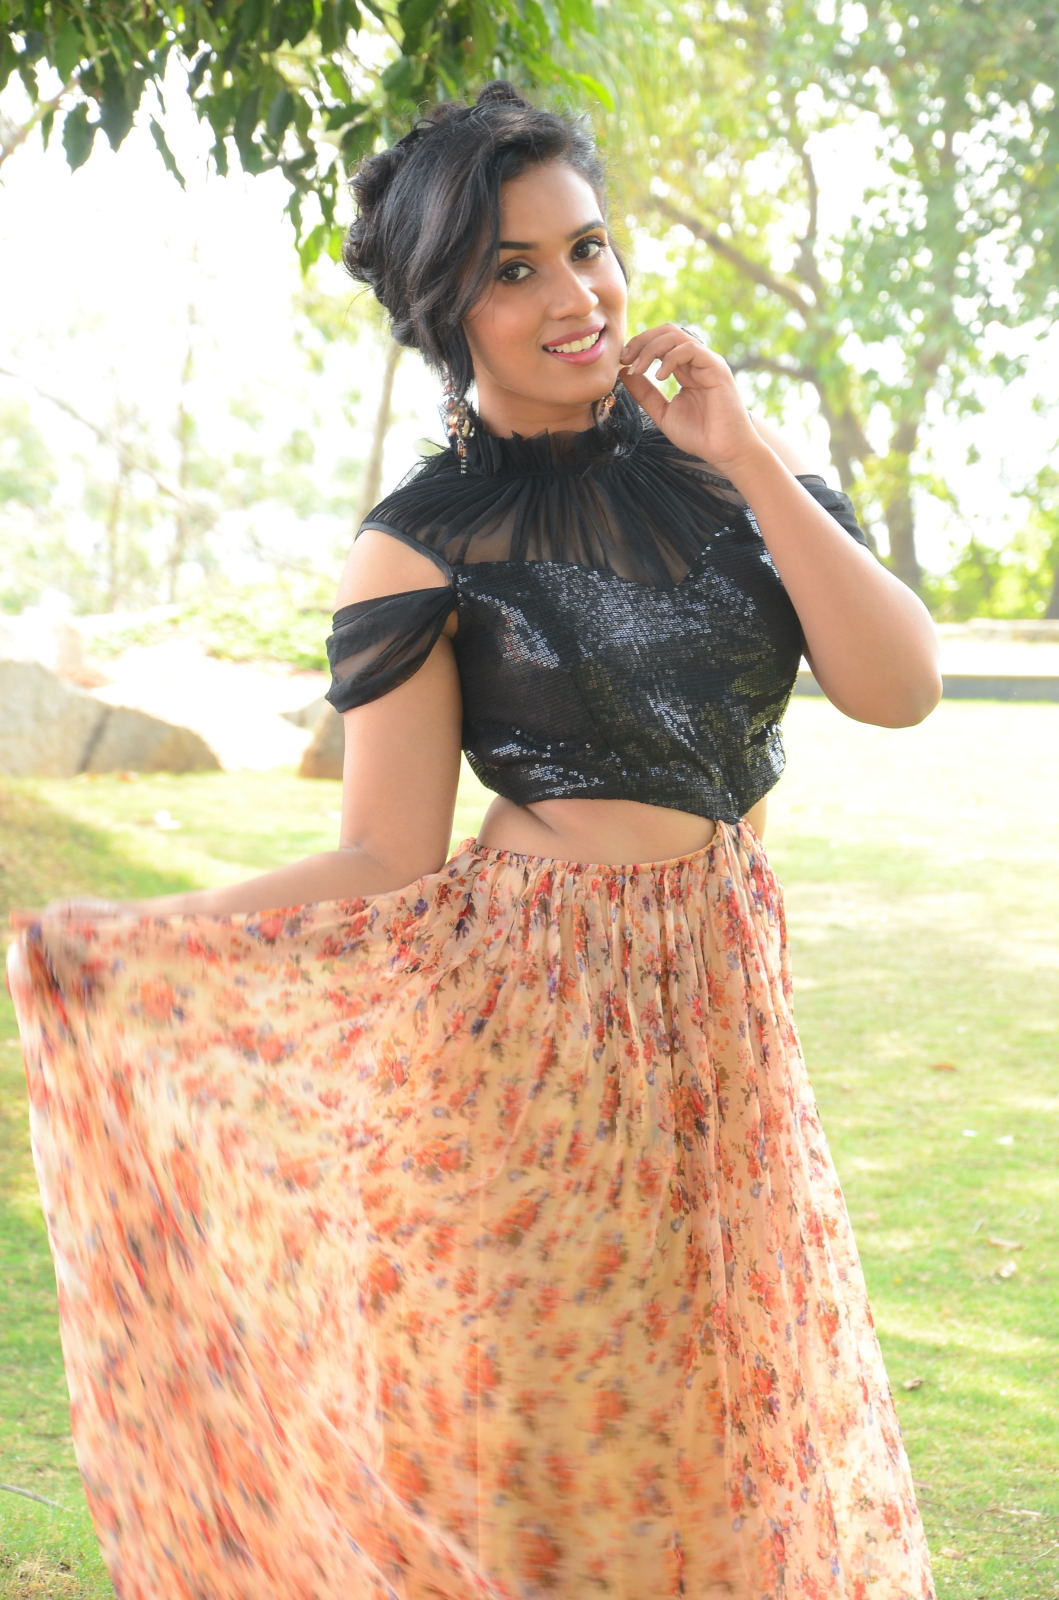 chetana uttej Brand New Photo Stills Of South Actress Chetana Uttej   Tollywood Chetana Uttej 23